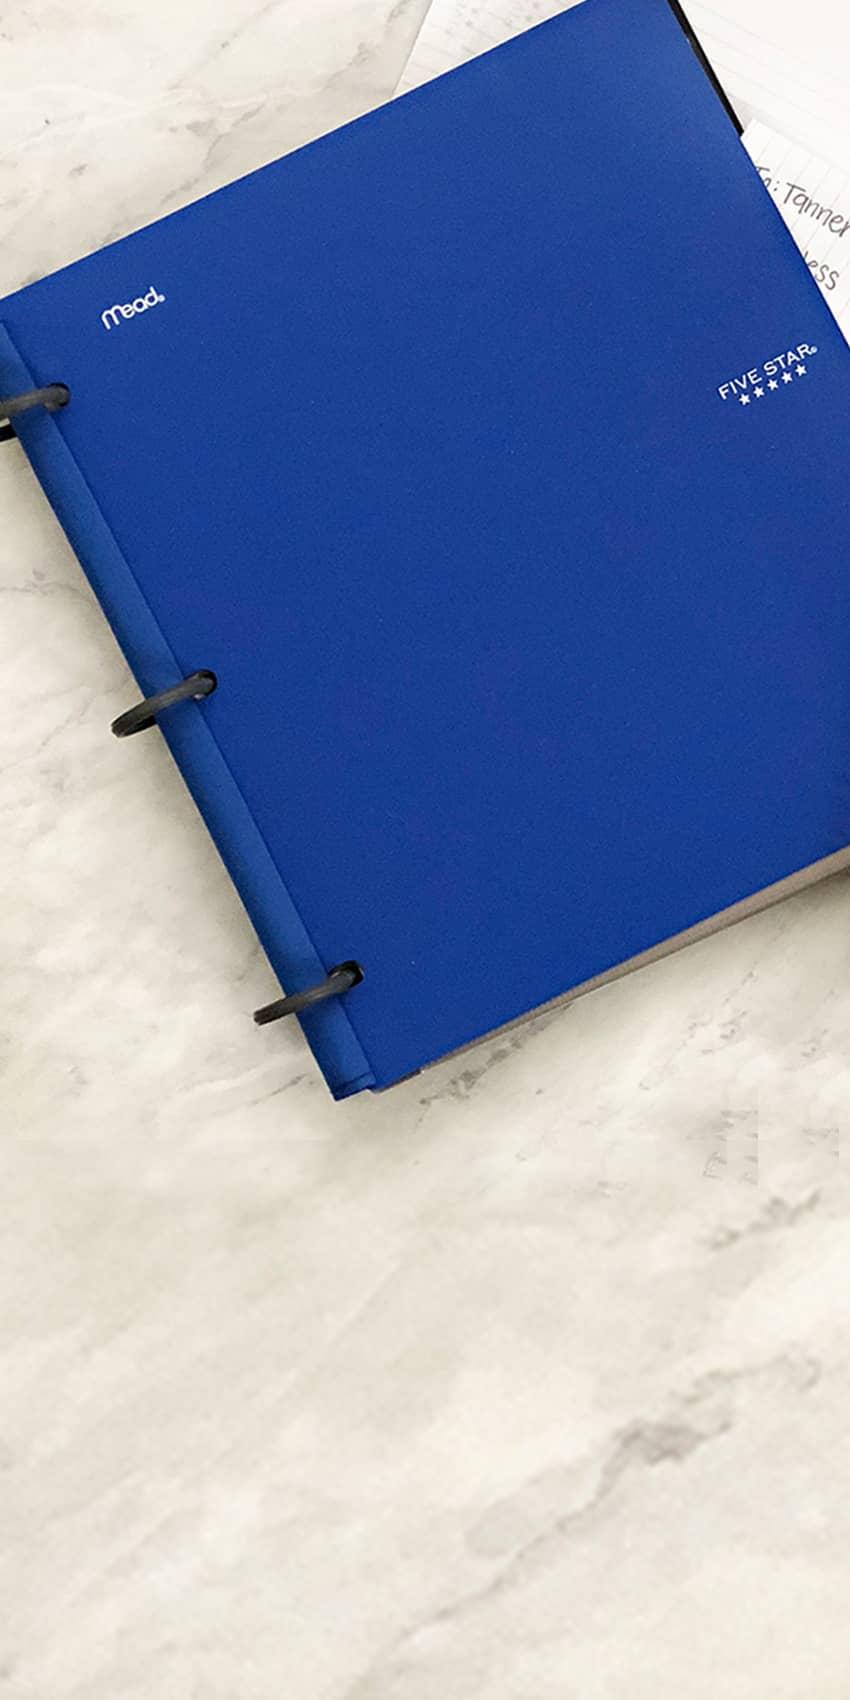 FiveStar notebooks